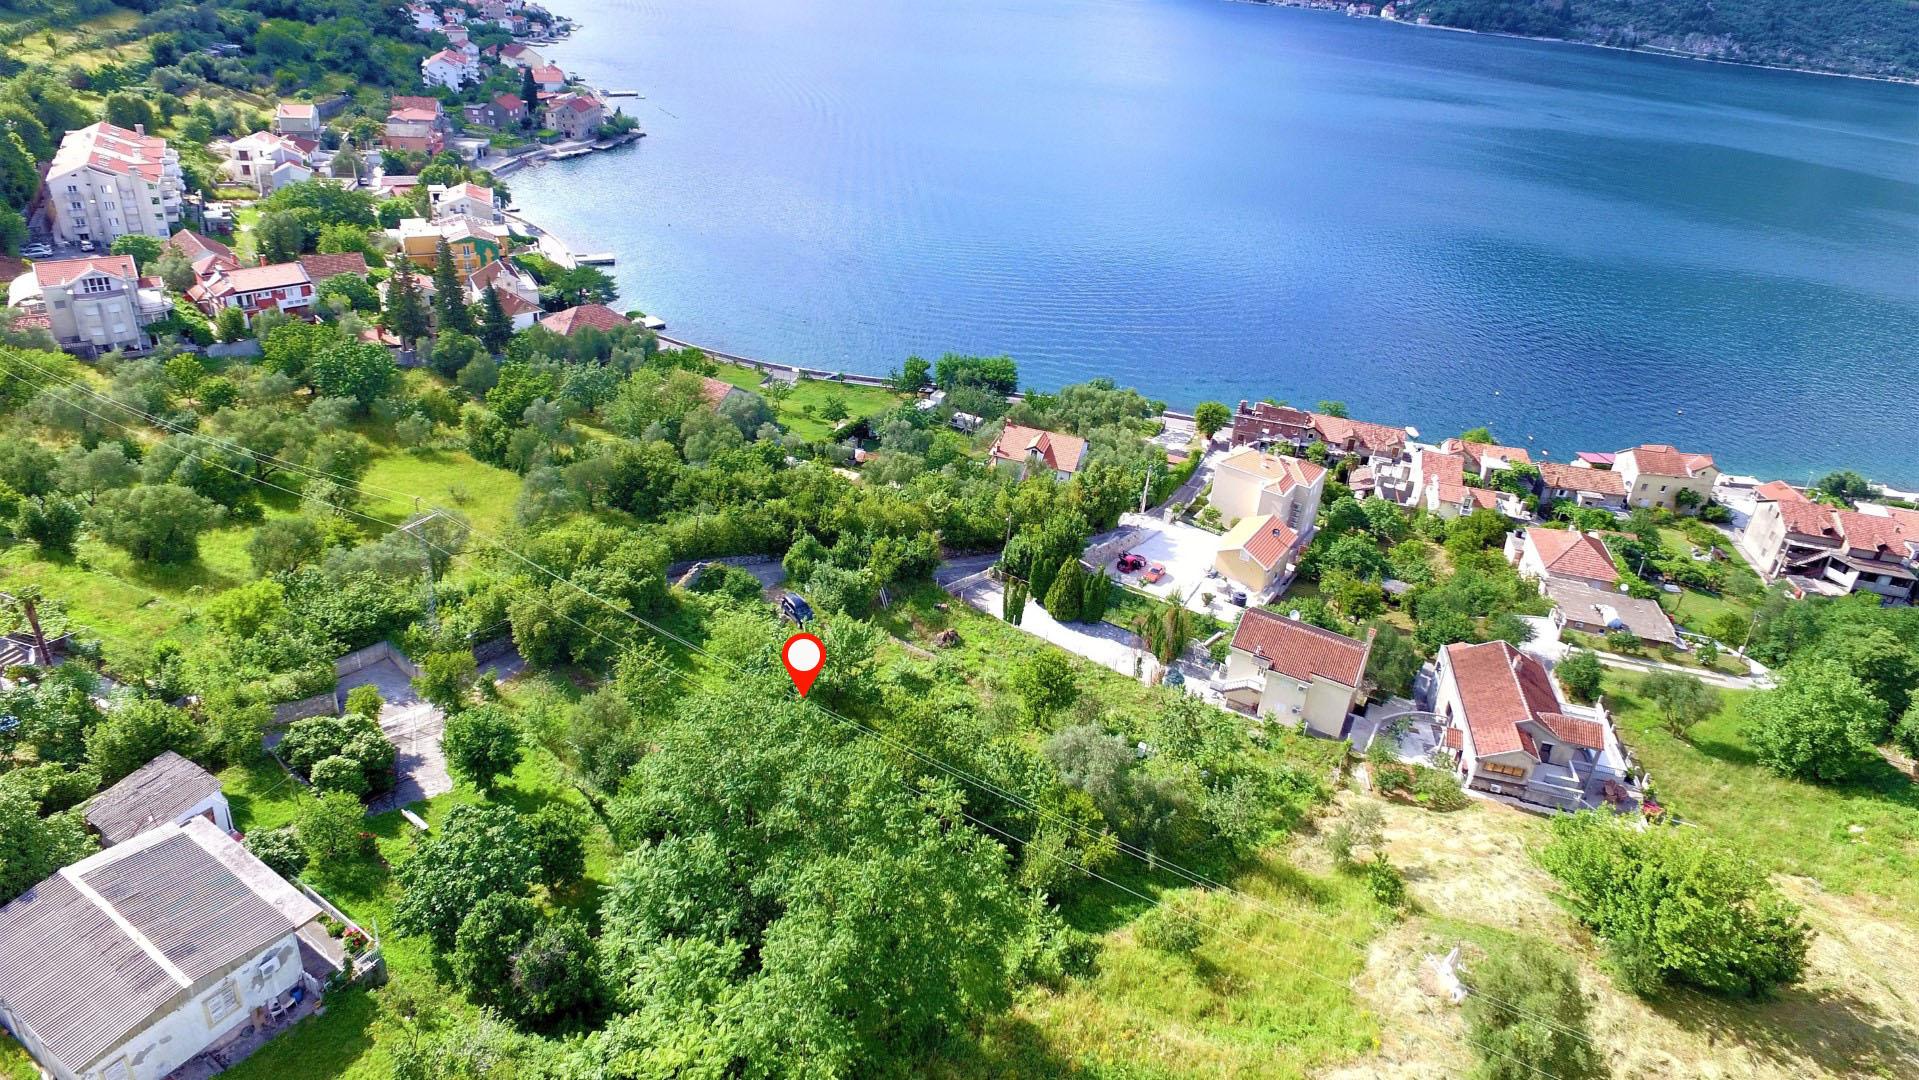 Котор, Столив - участок под застройку с панорамным видом на море